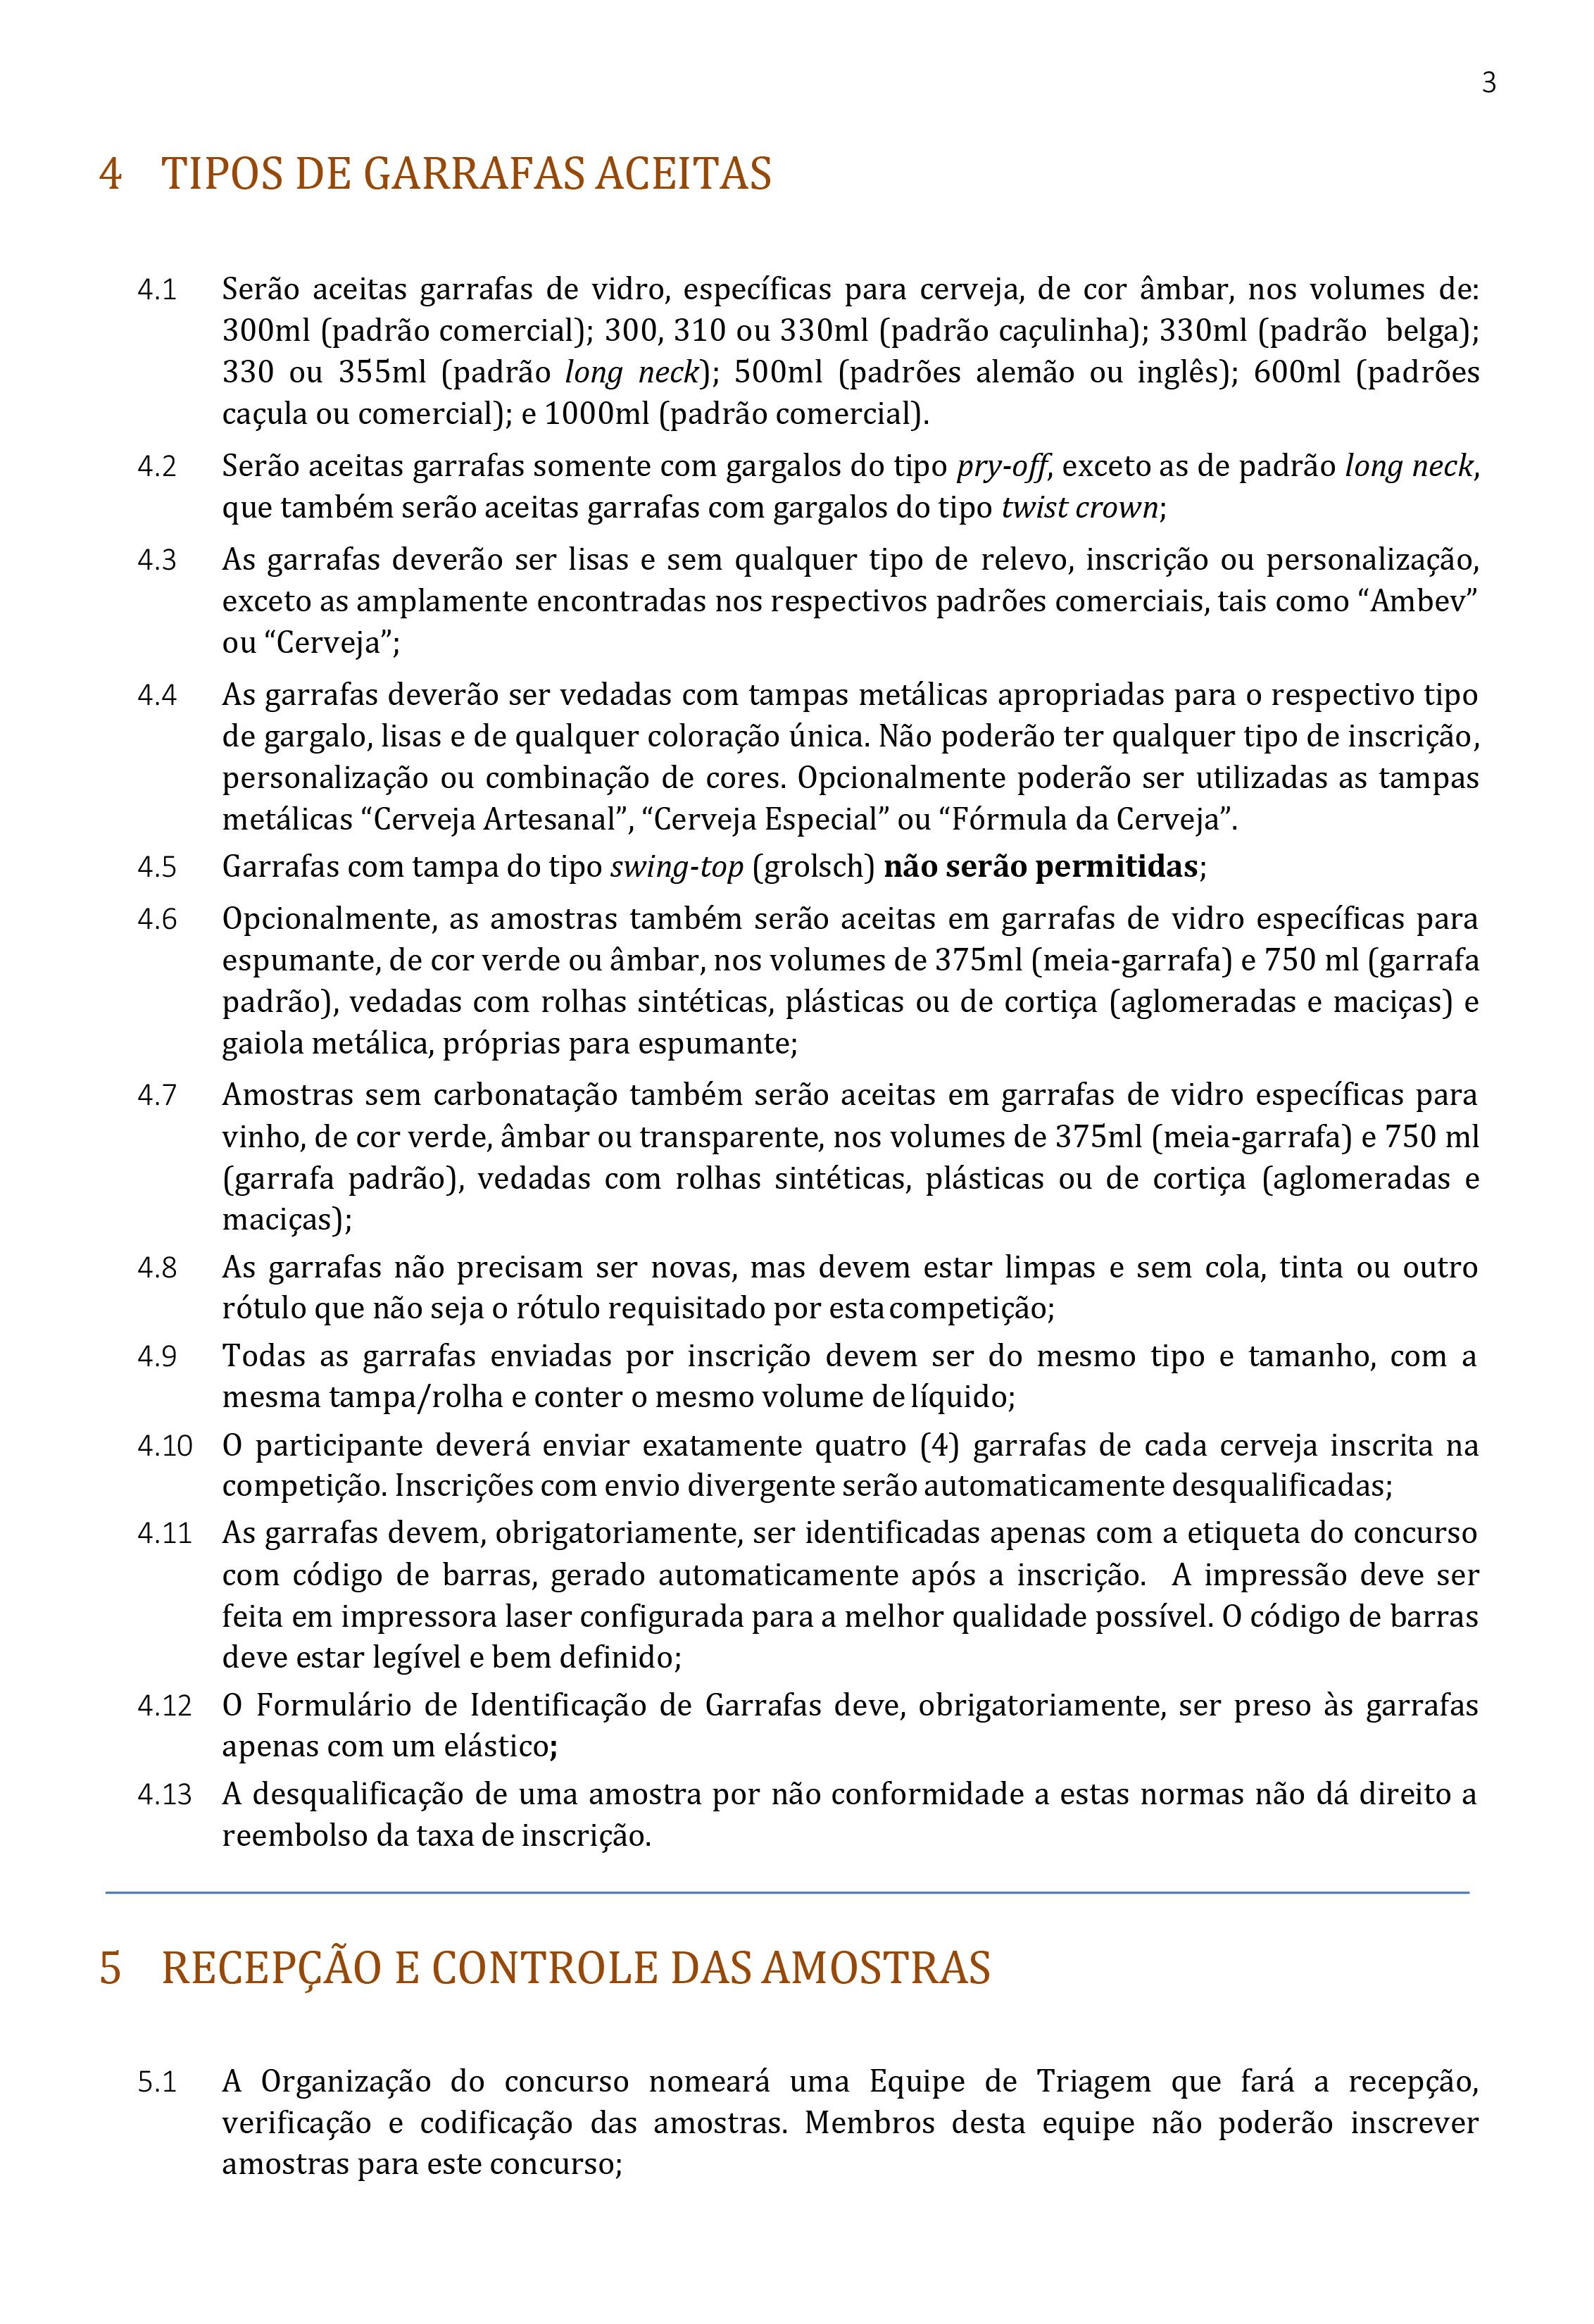 IV Concurso Sulbrasileiro 2017-Regulamento-3.jpg